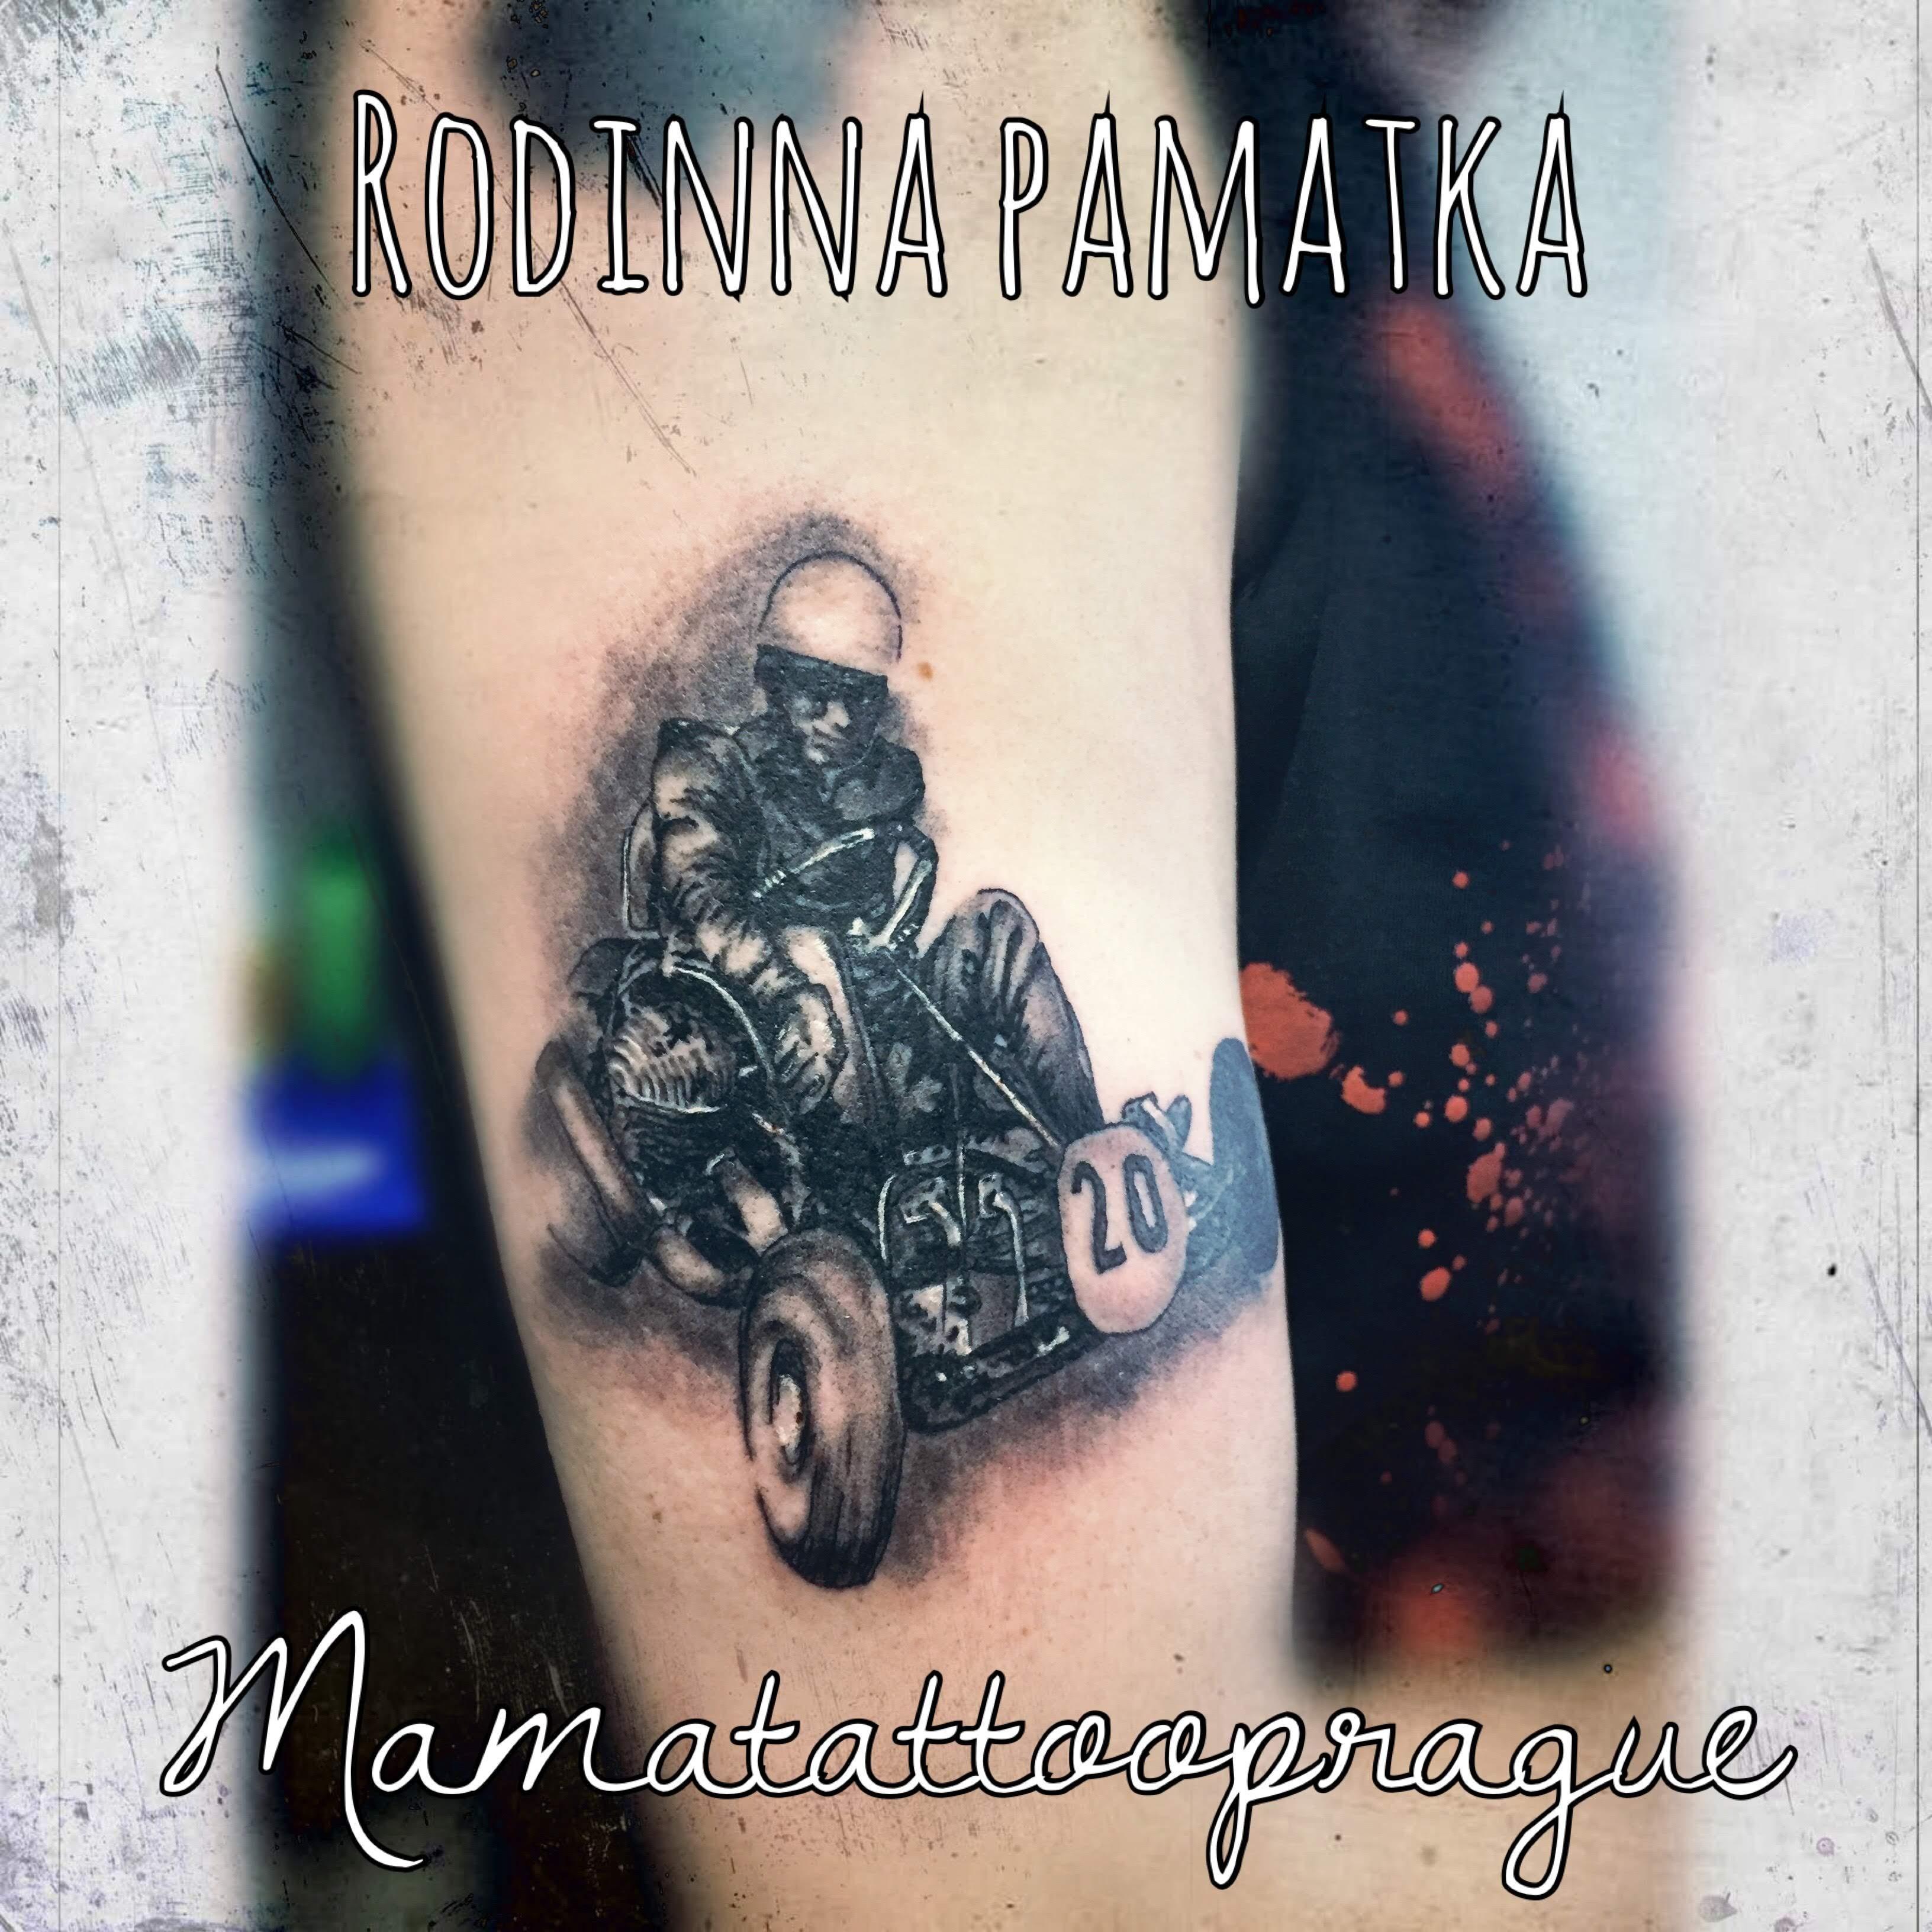 tattoo rodinna pamatka